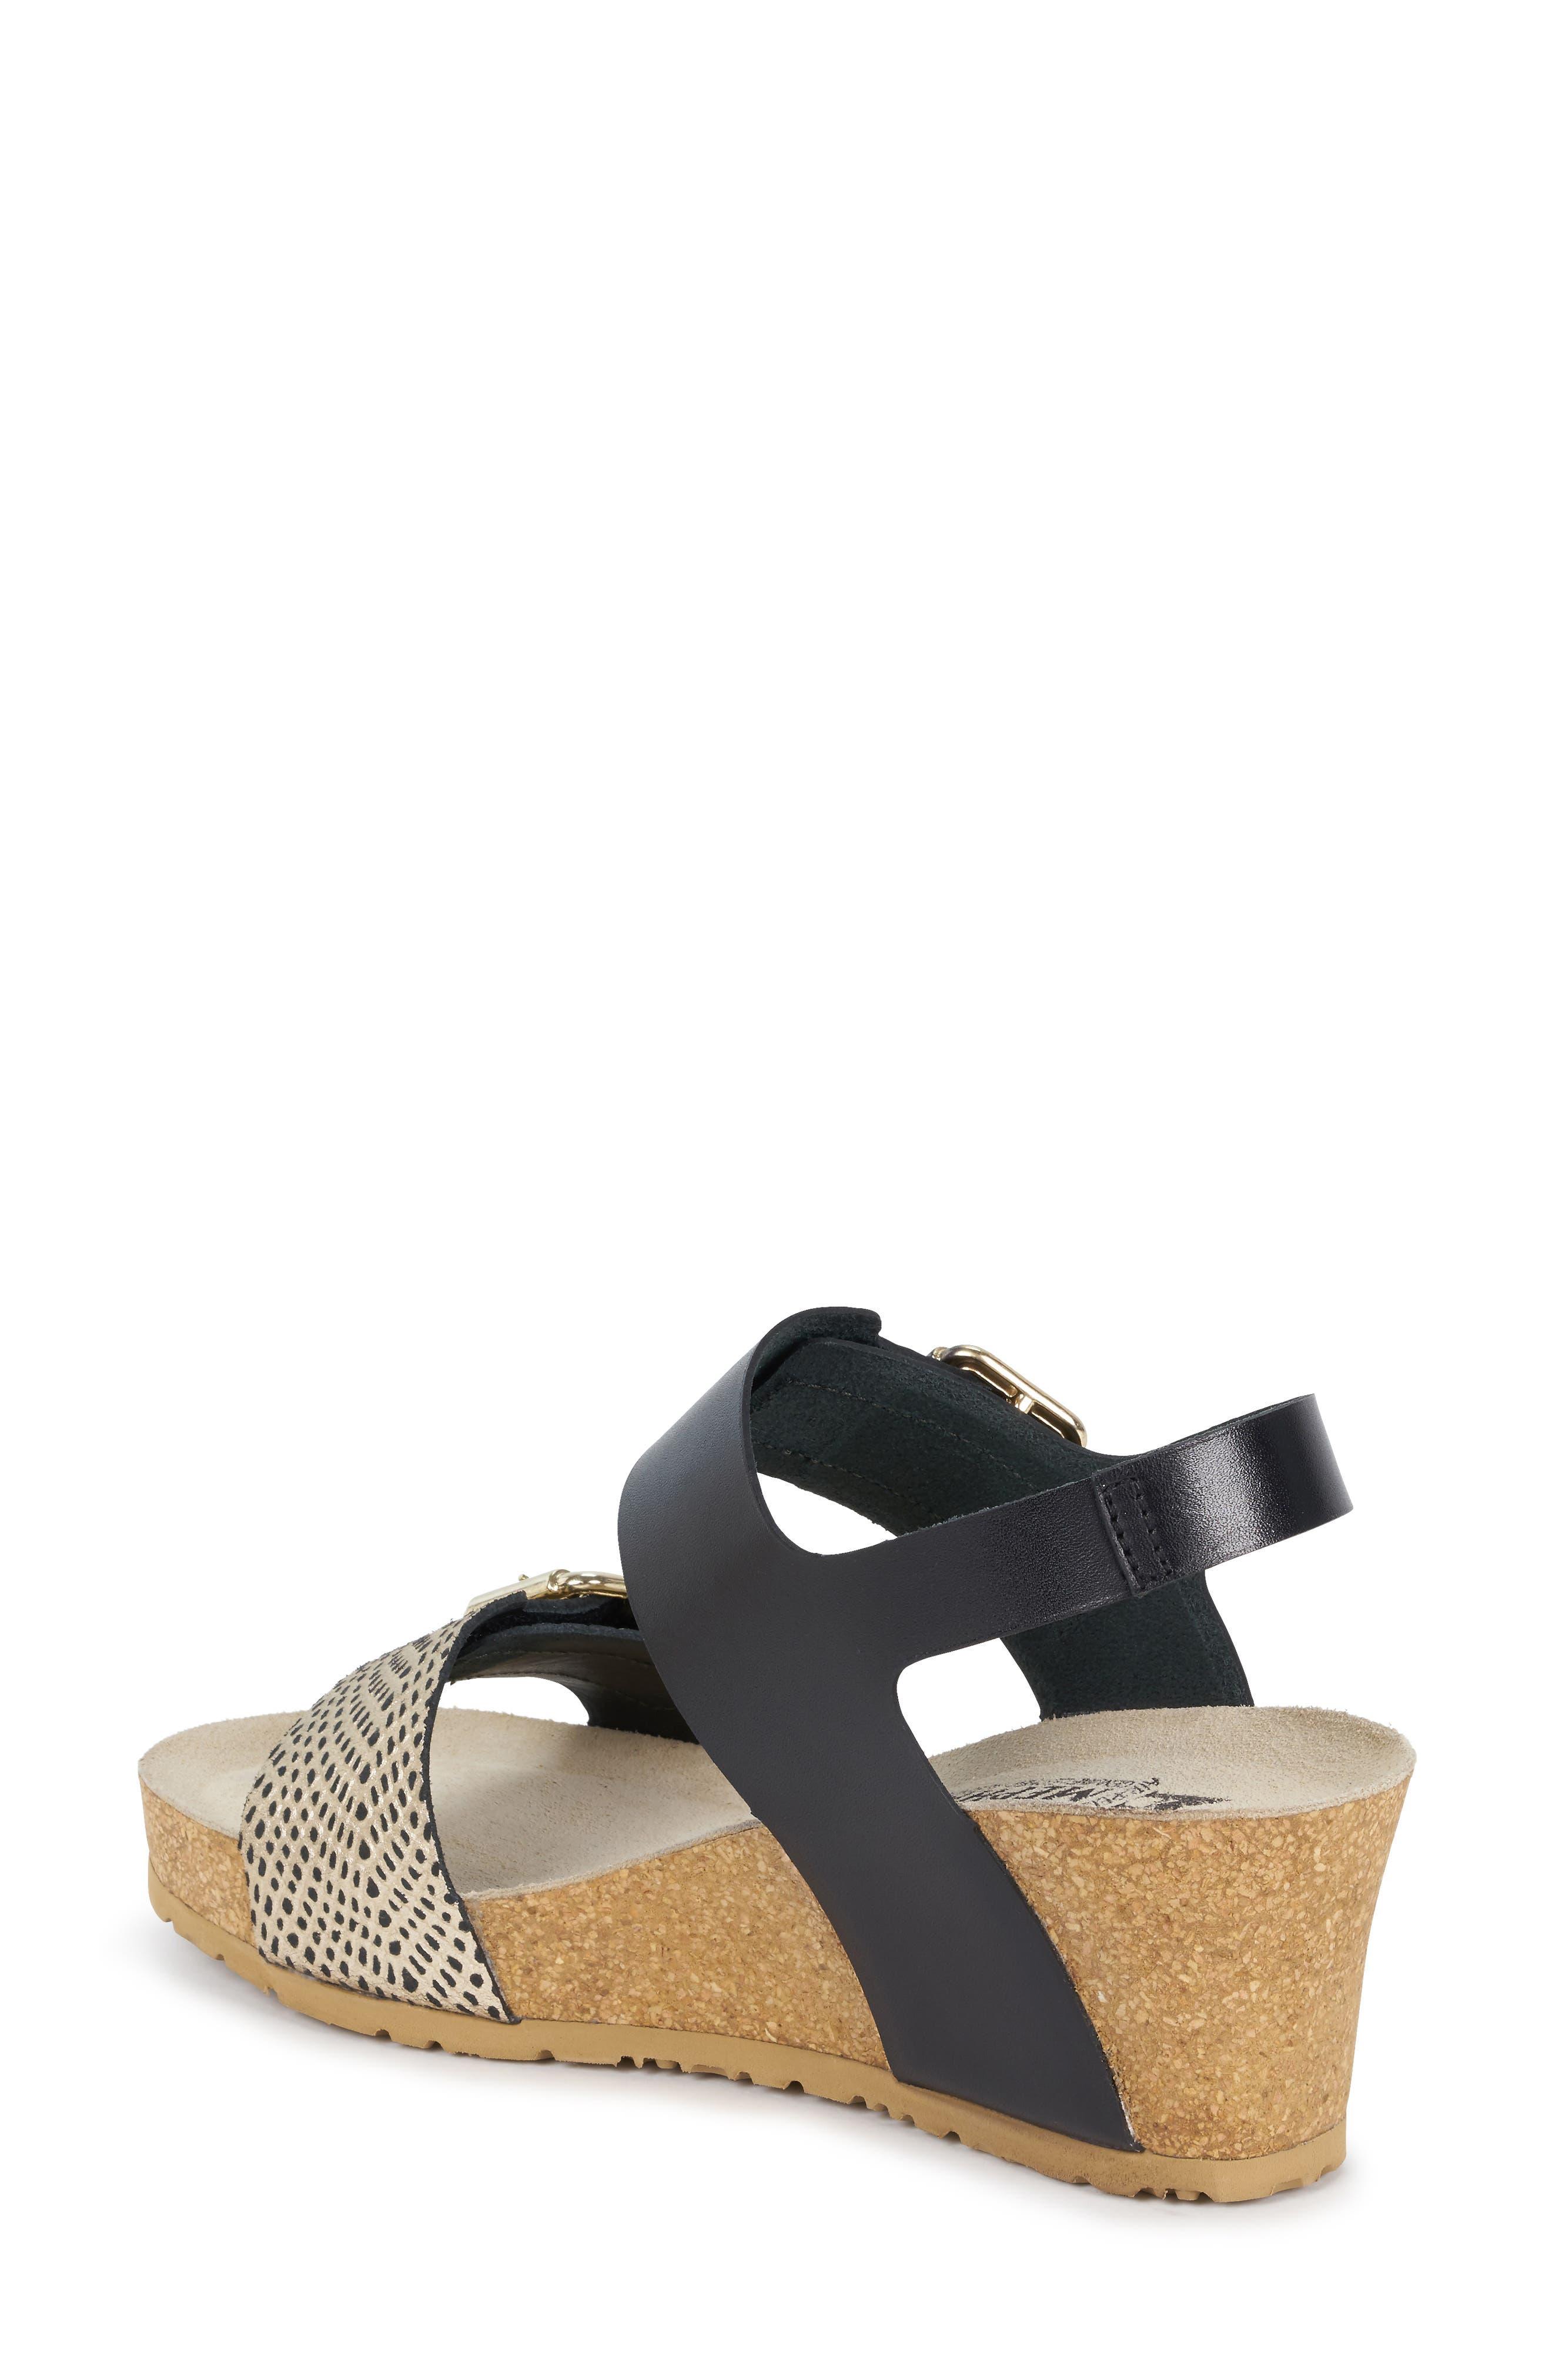 MEPHISTO, Lissandra Platform Wedge Sandal, Alternate thumbnail 2, color, BLACK/ GOLD LEATHER